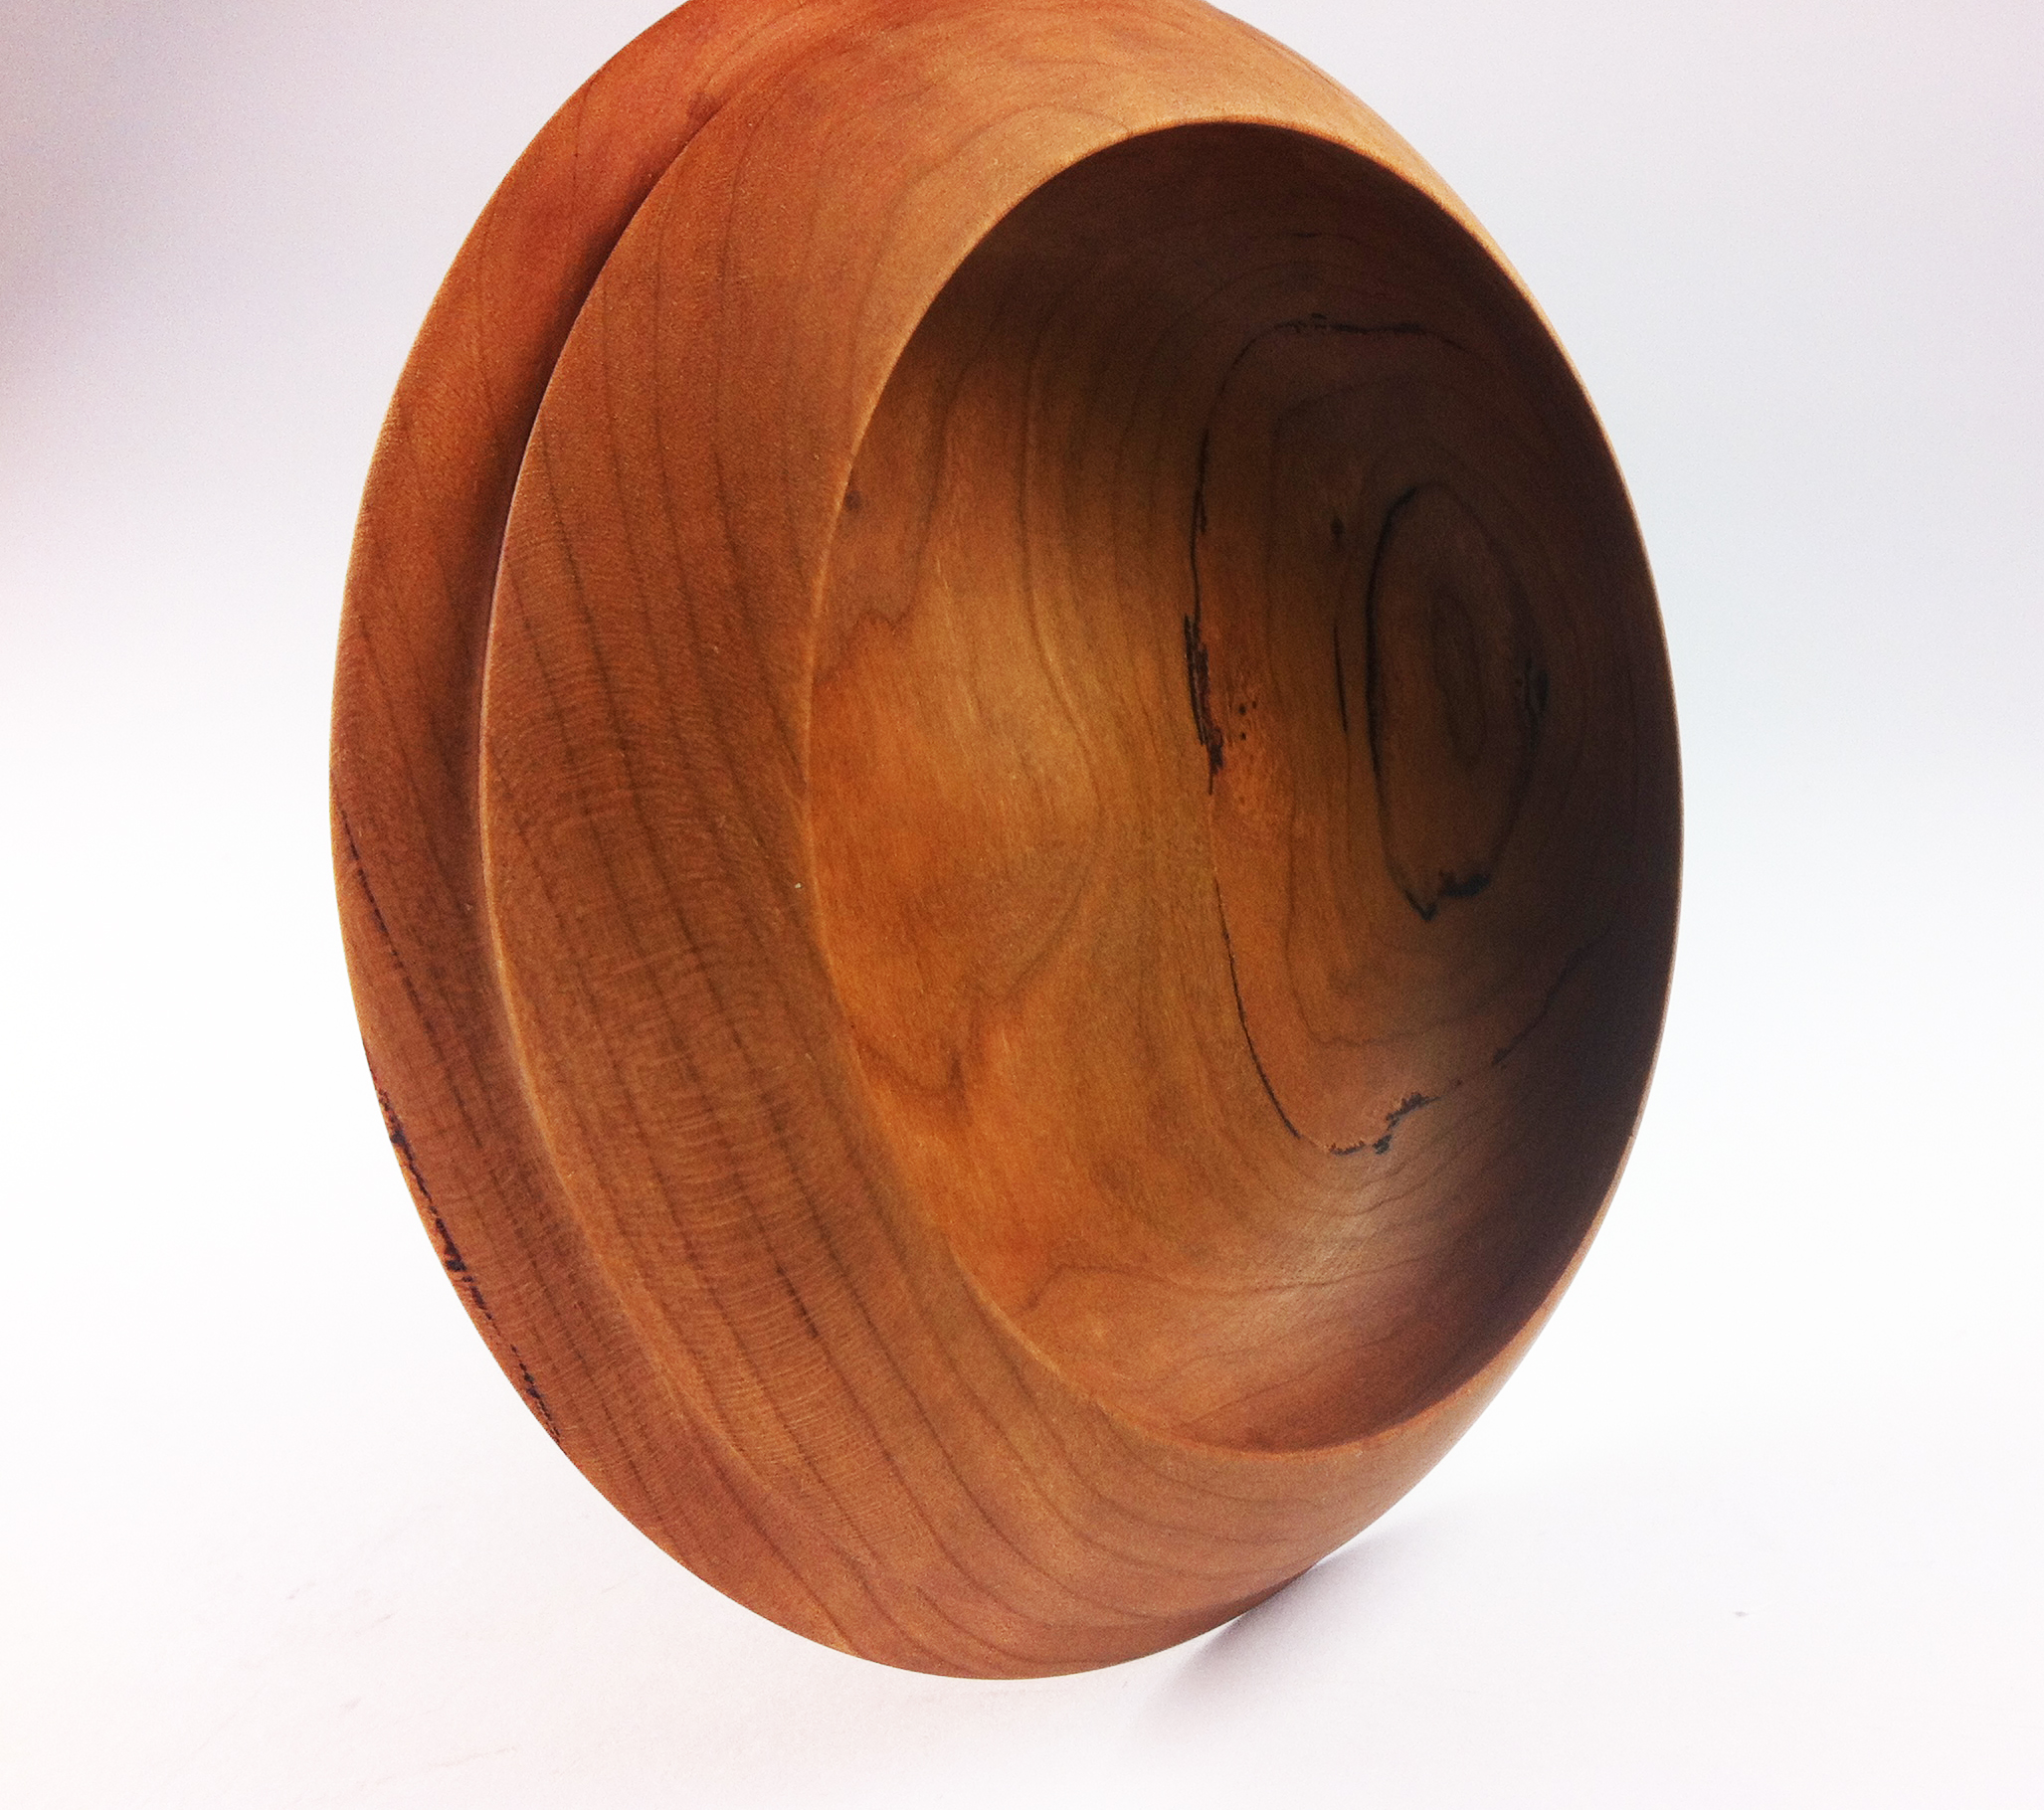 bowl3-7.jpg